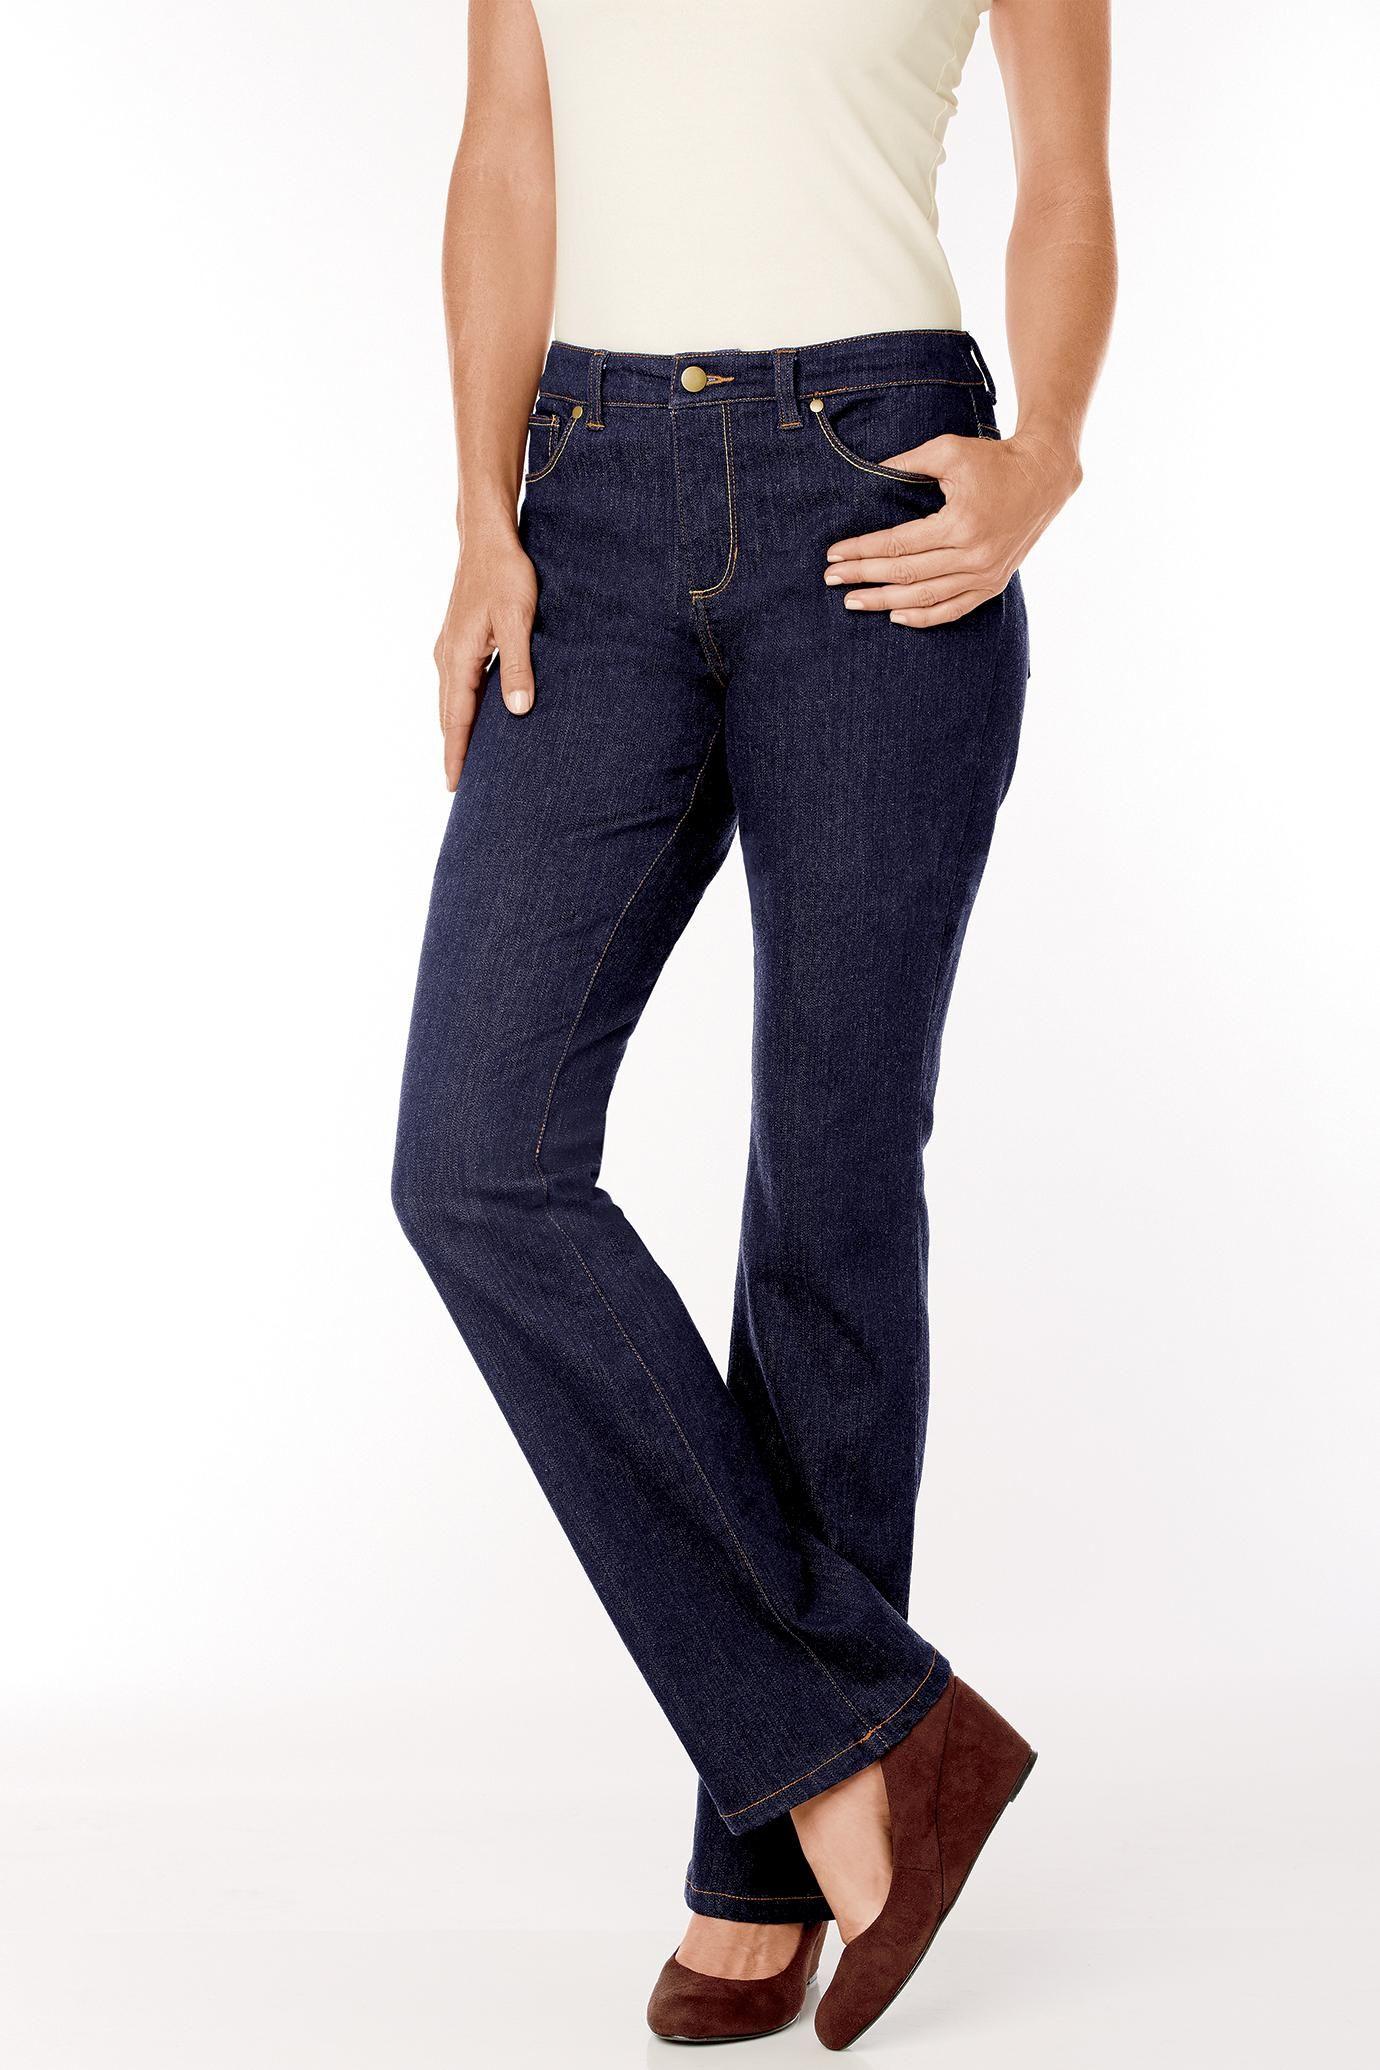 Tummy-Slimmer Jeans by JG Hook   Chadwicks of Boston